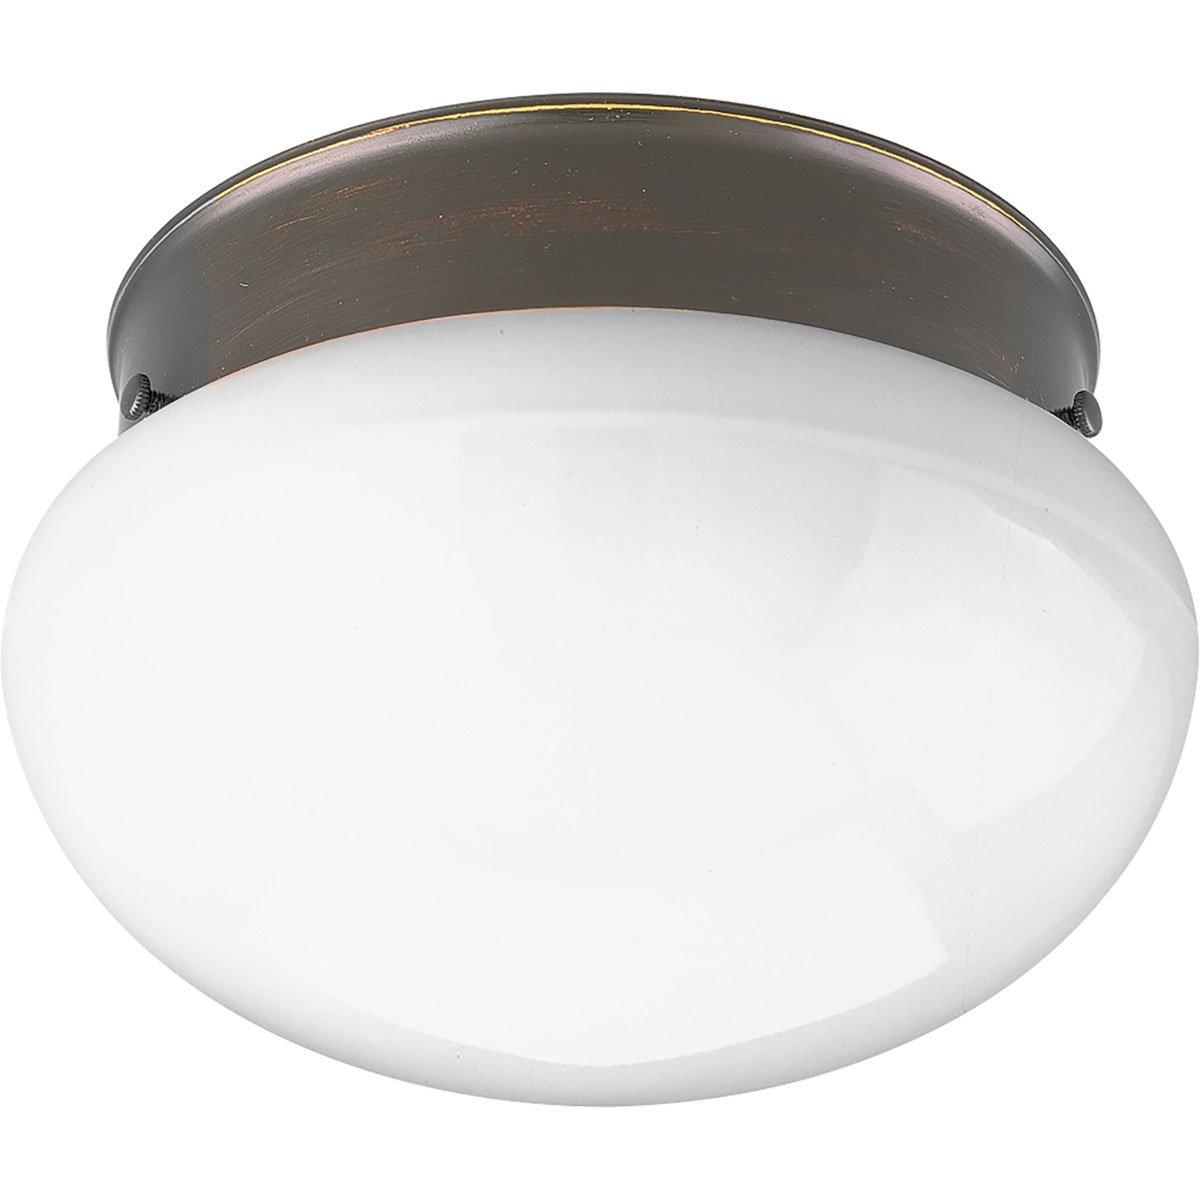 Progress Lighting P3408-2030K9 1-17W LED 3000K Flush Mount, Antique Bronze - - Amazon.com